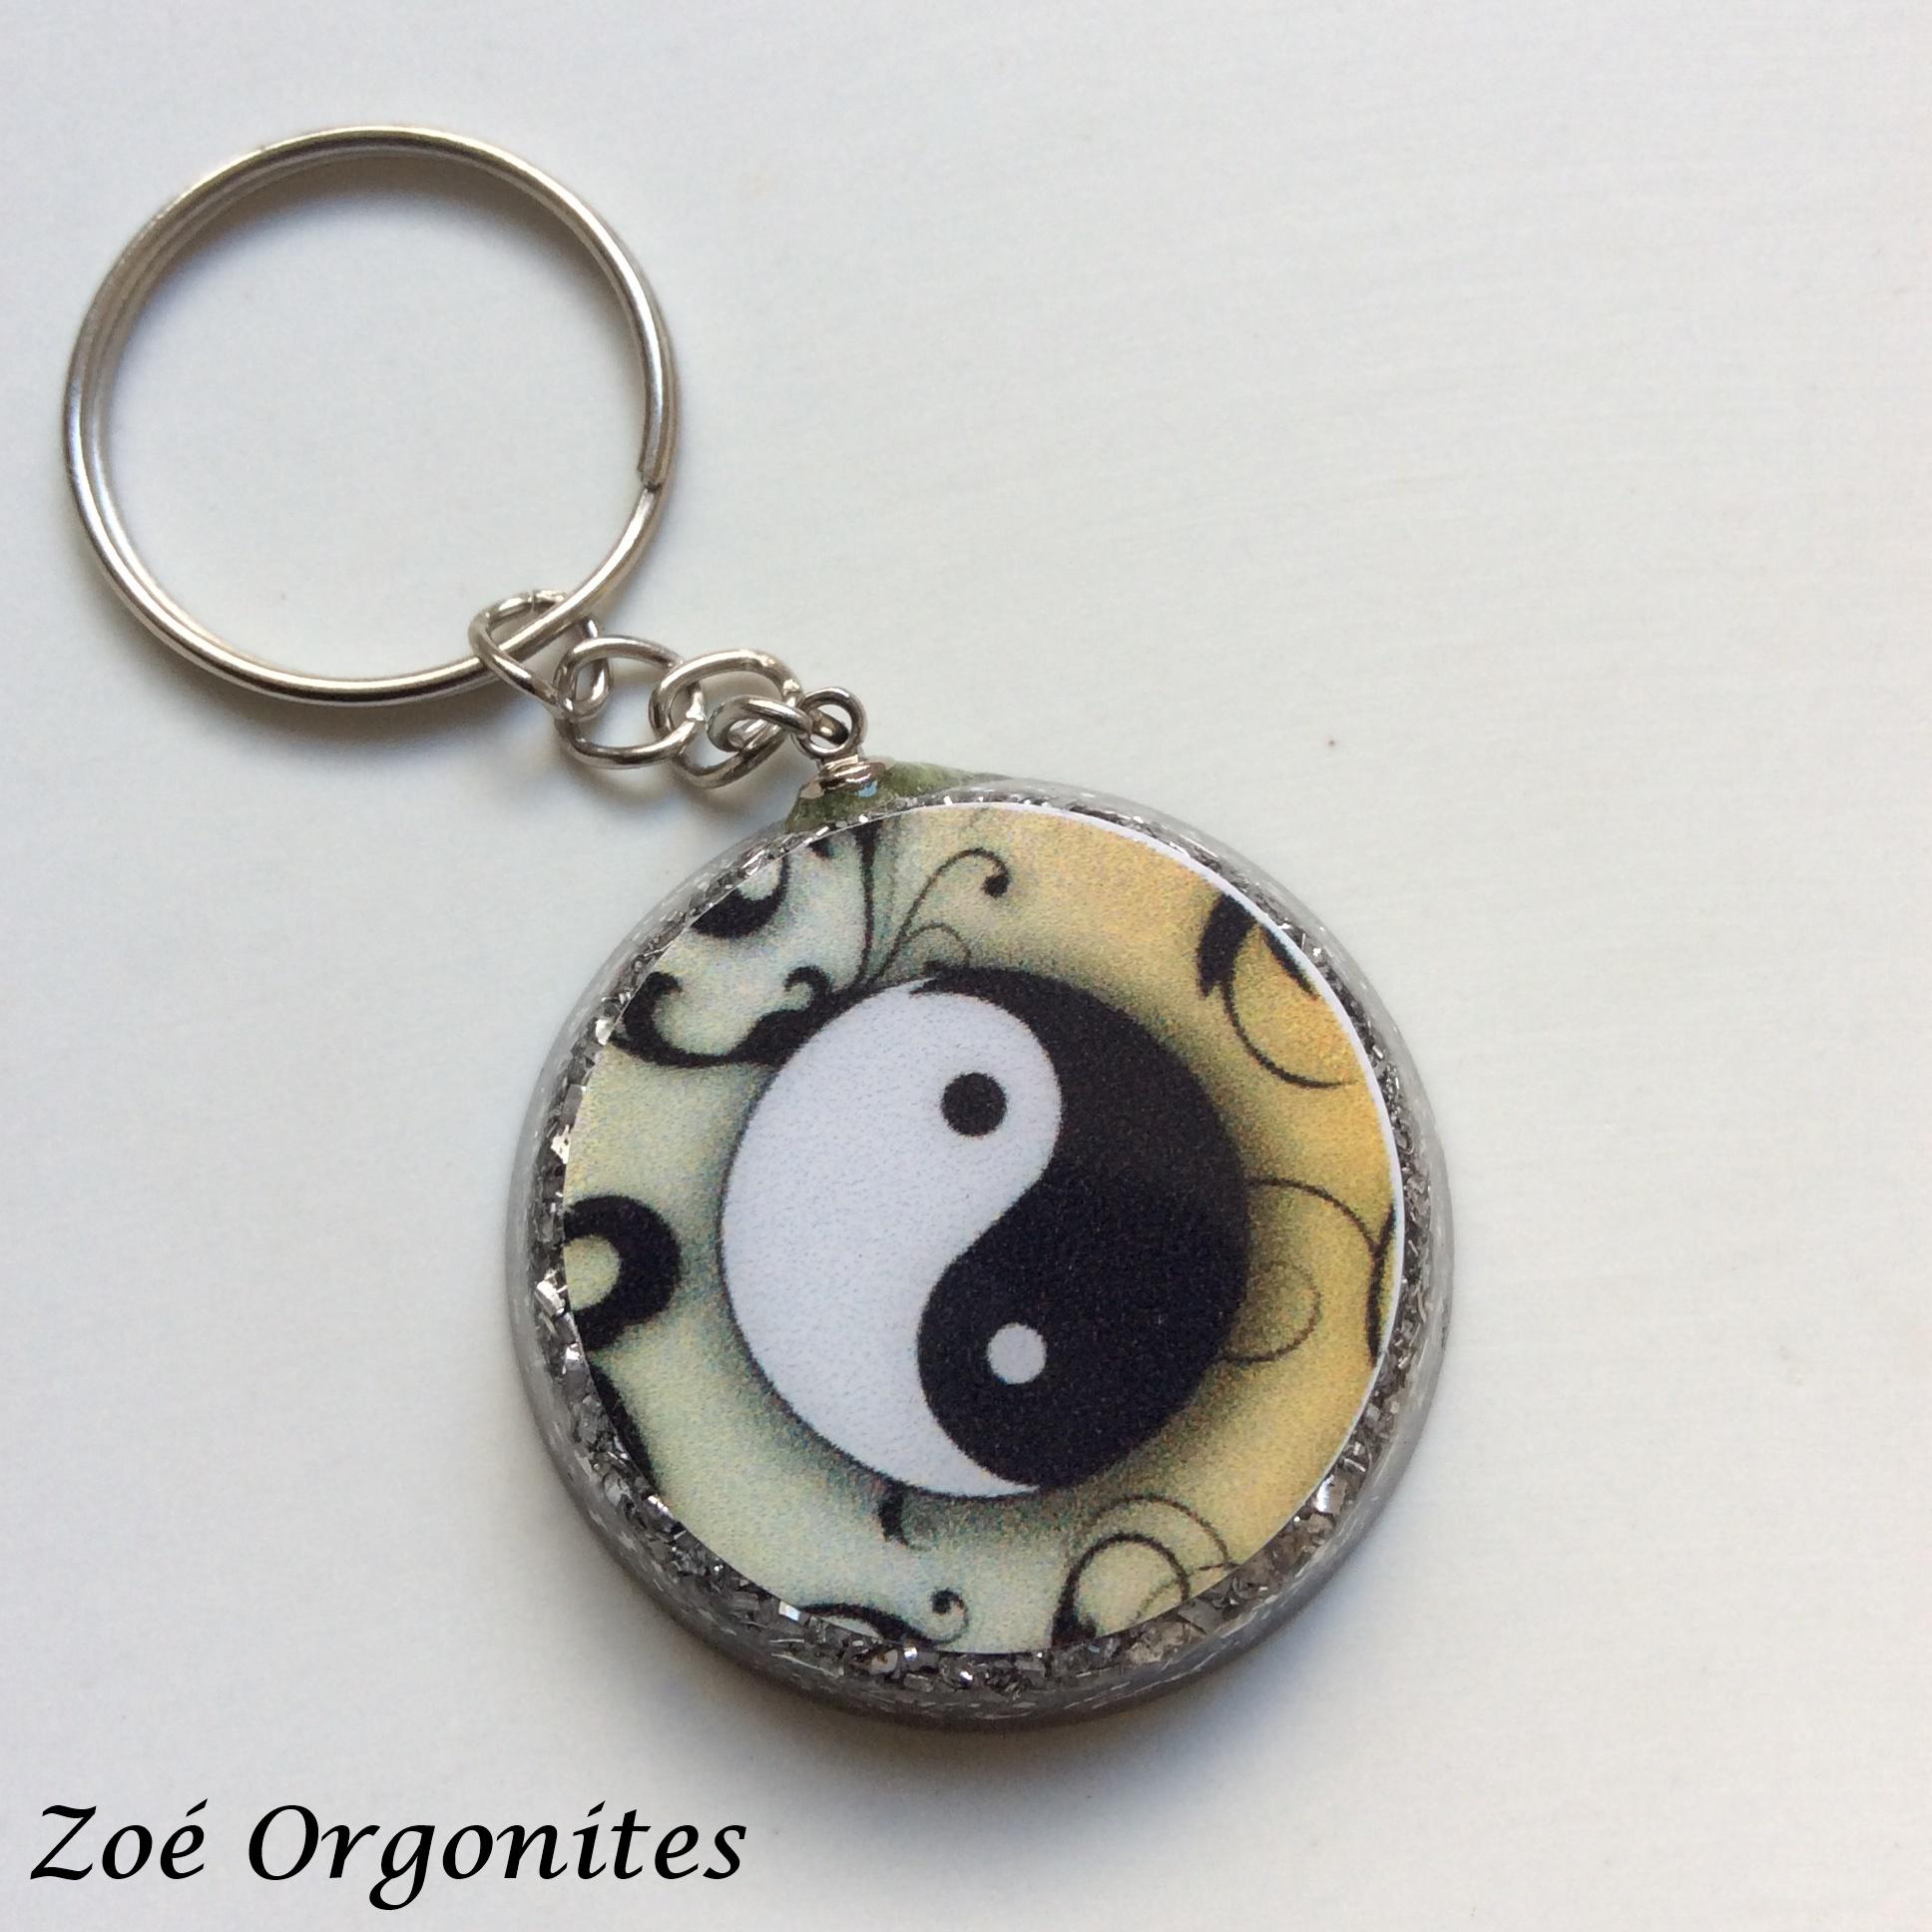 Chaveiro em orgonite Yin Yang